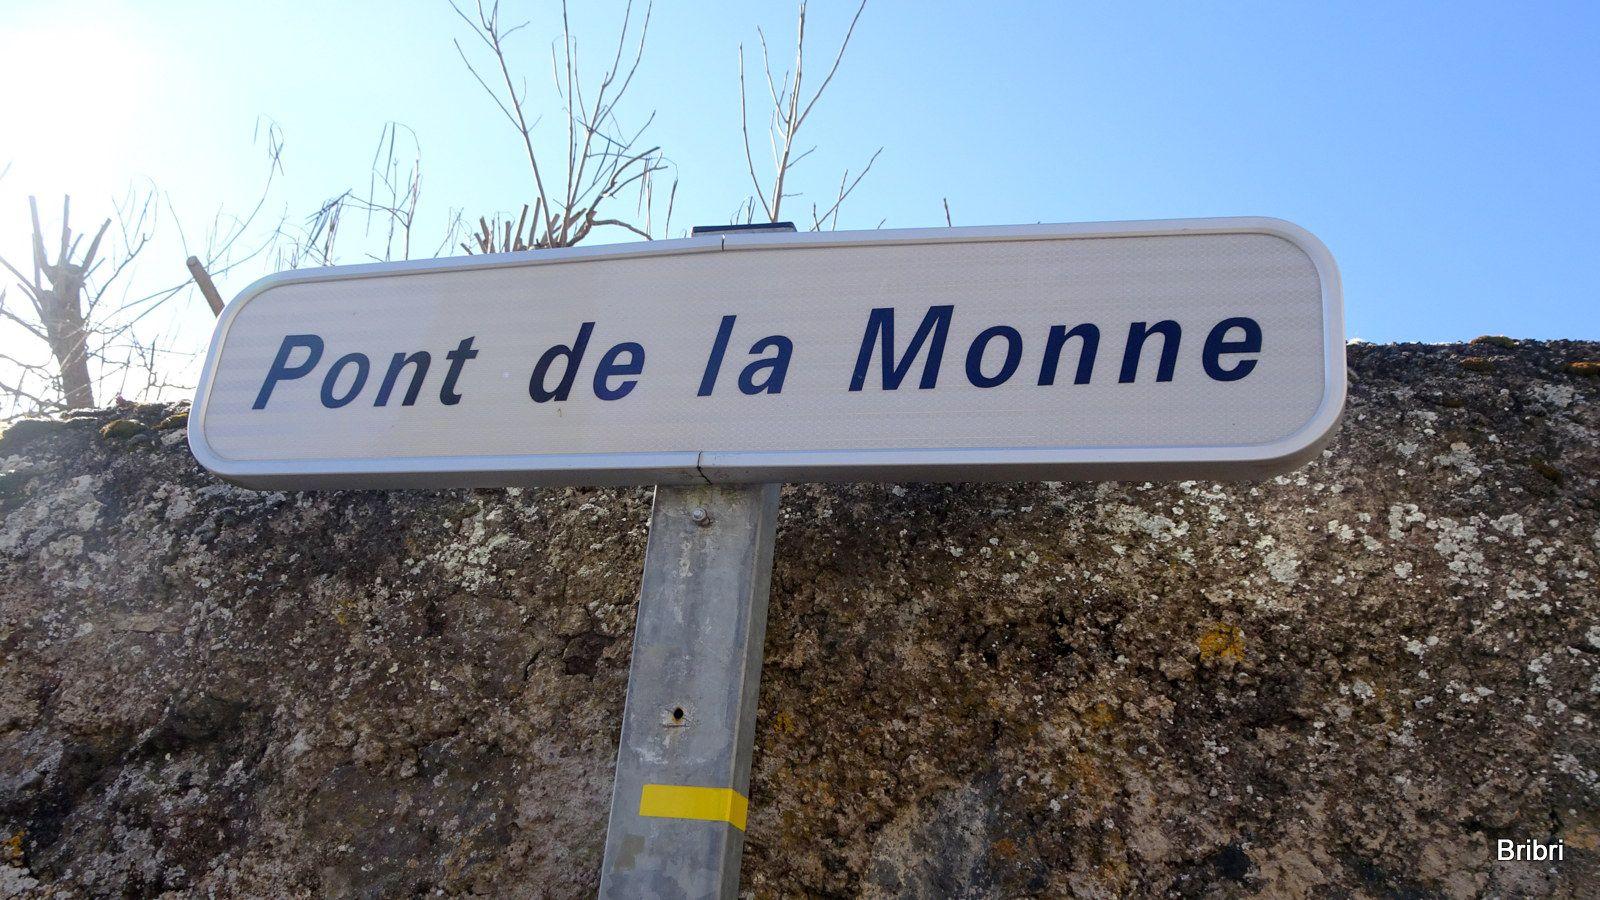 Rando à St Amant Tallende. (20N2) + resto/morue.